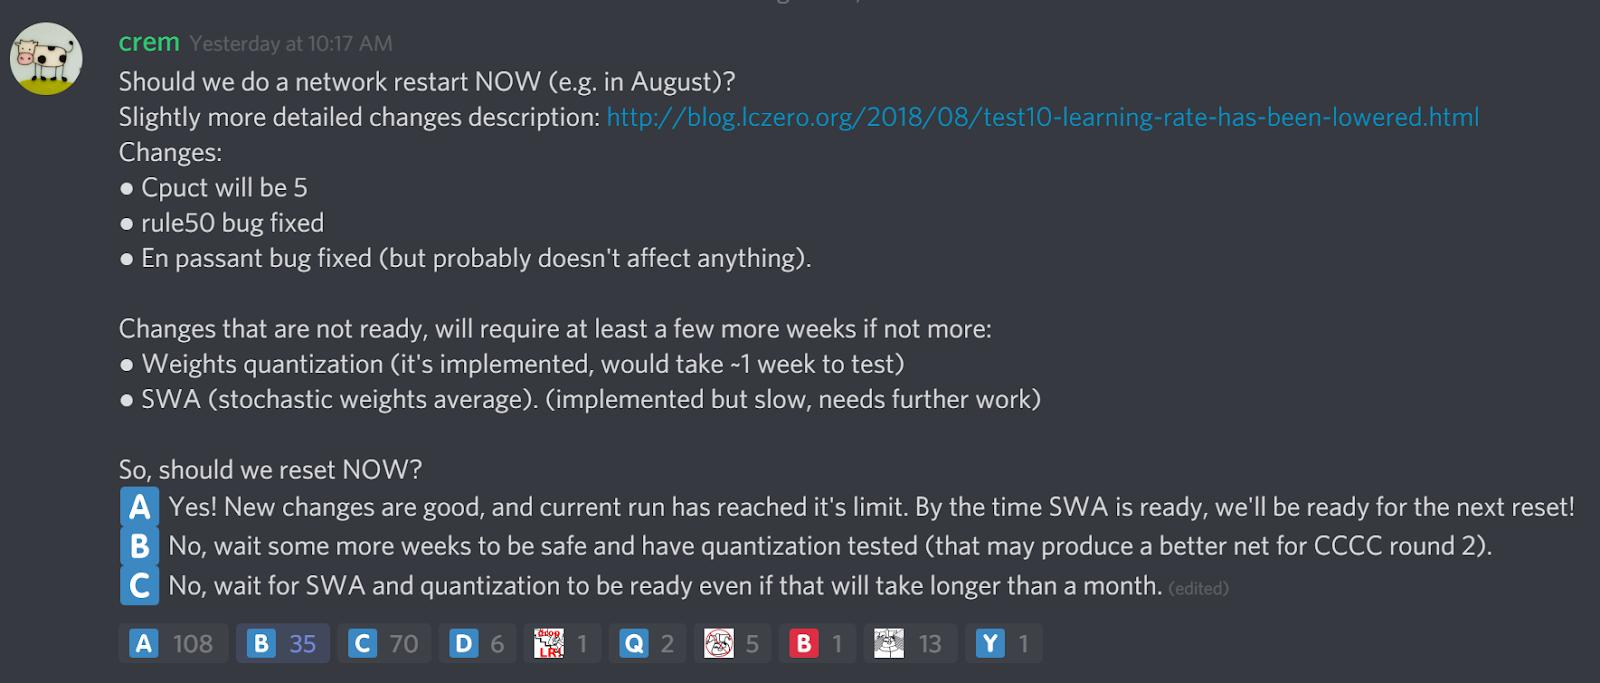 LCZero blog: August 2018